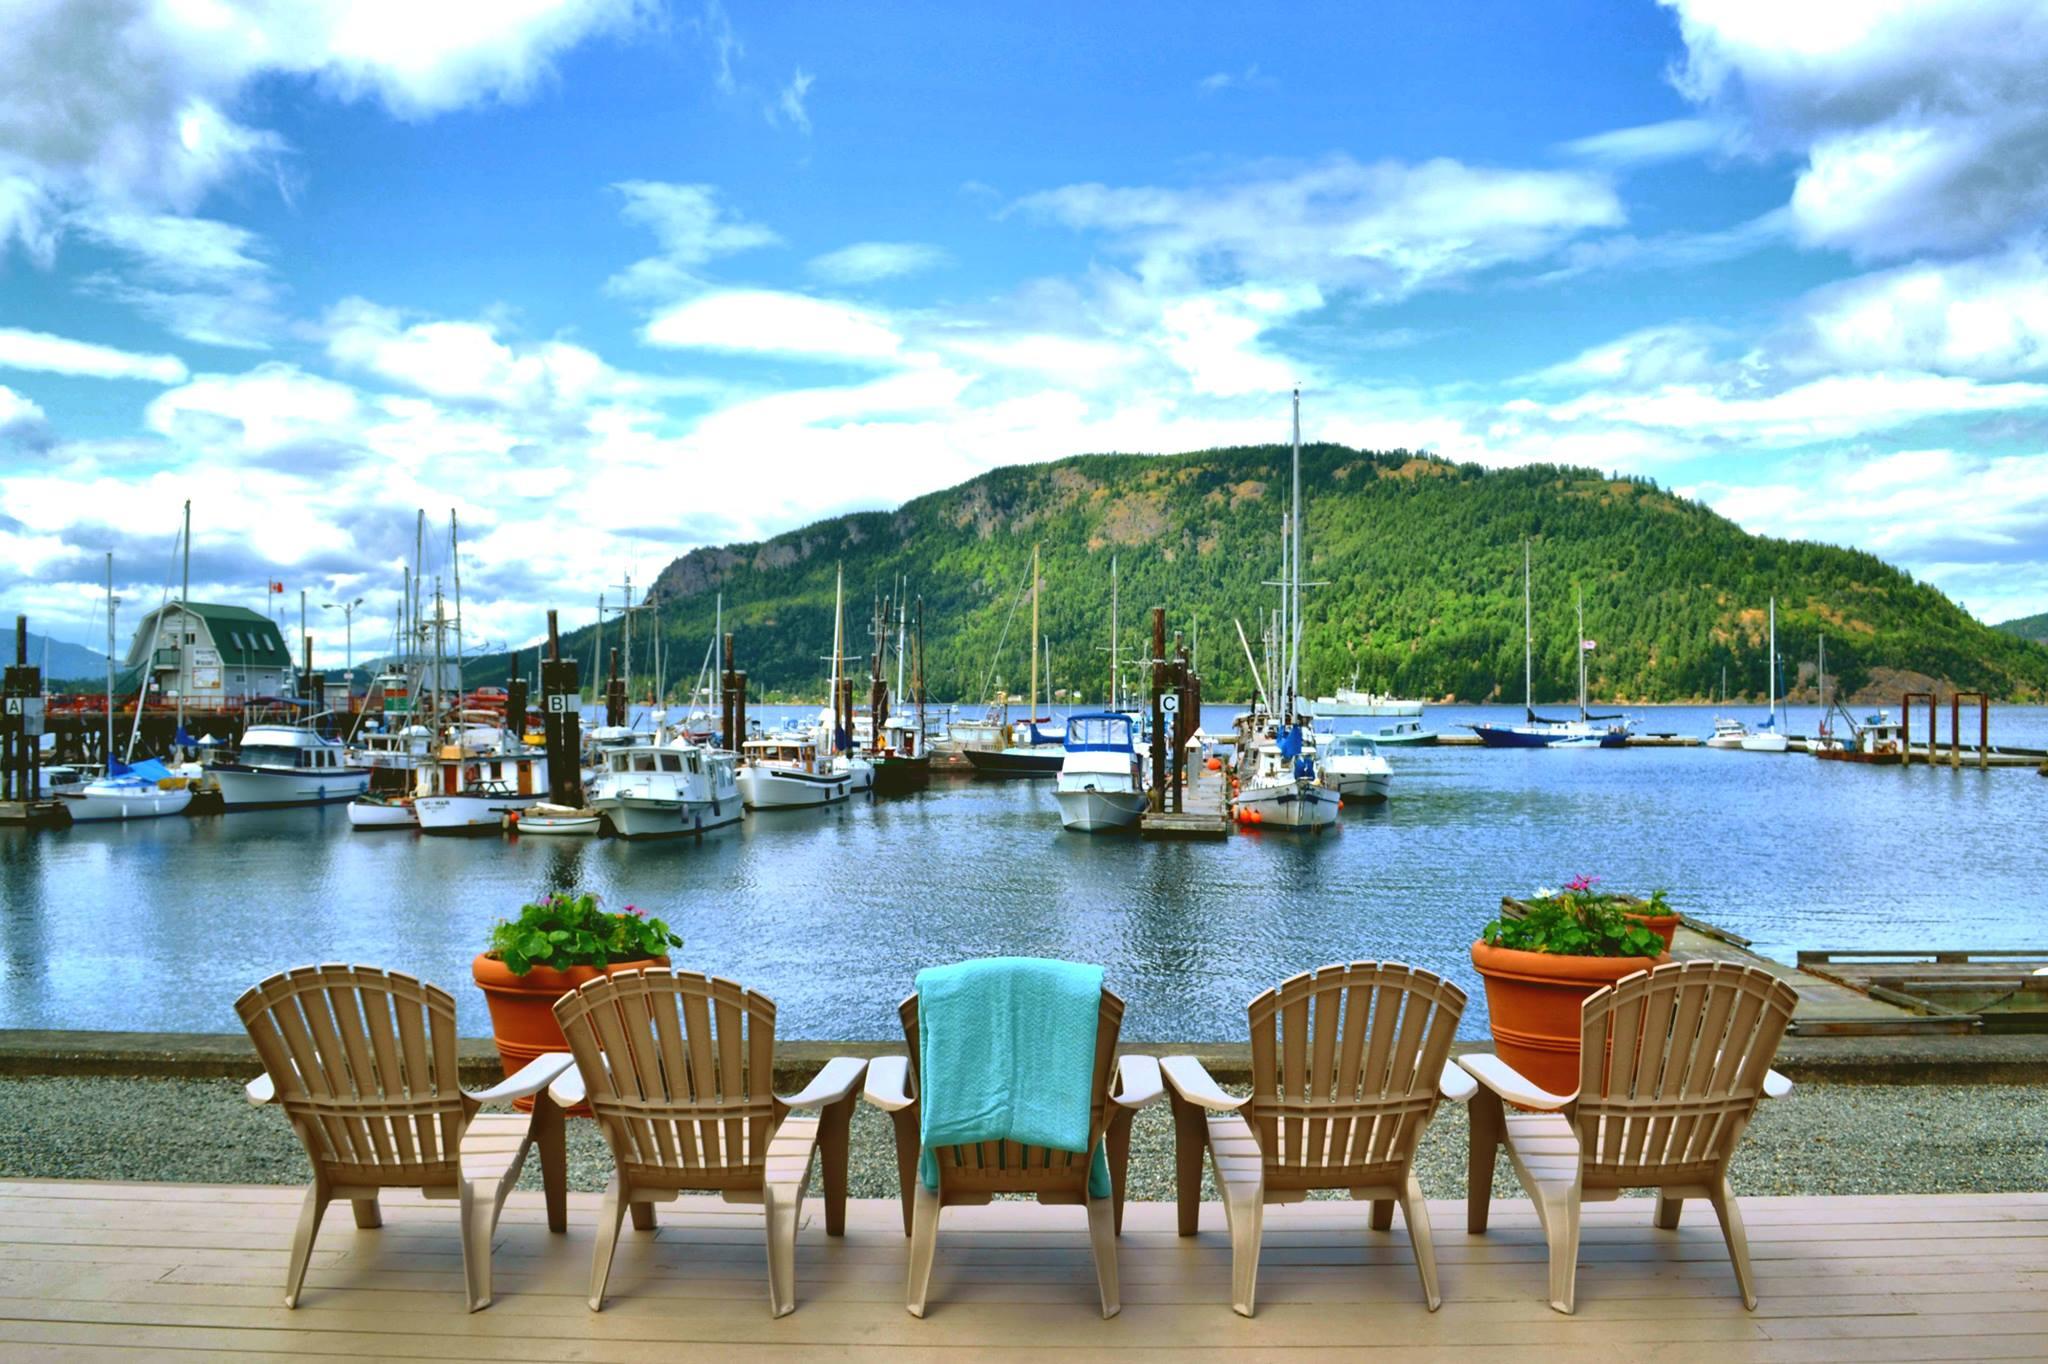 https://res.cloudinary.com/pacific-coastal-cruises-and-tours/image/upload/v1616432554/11223774_1004473076271197_1094035841300732303_o_ocrlcd.jpg